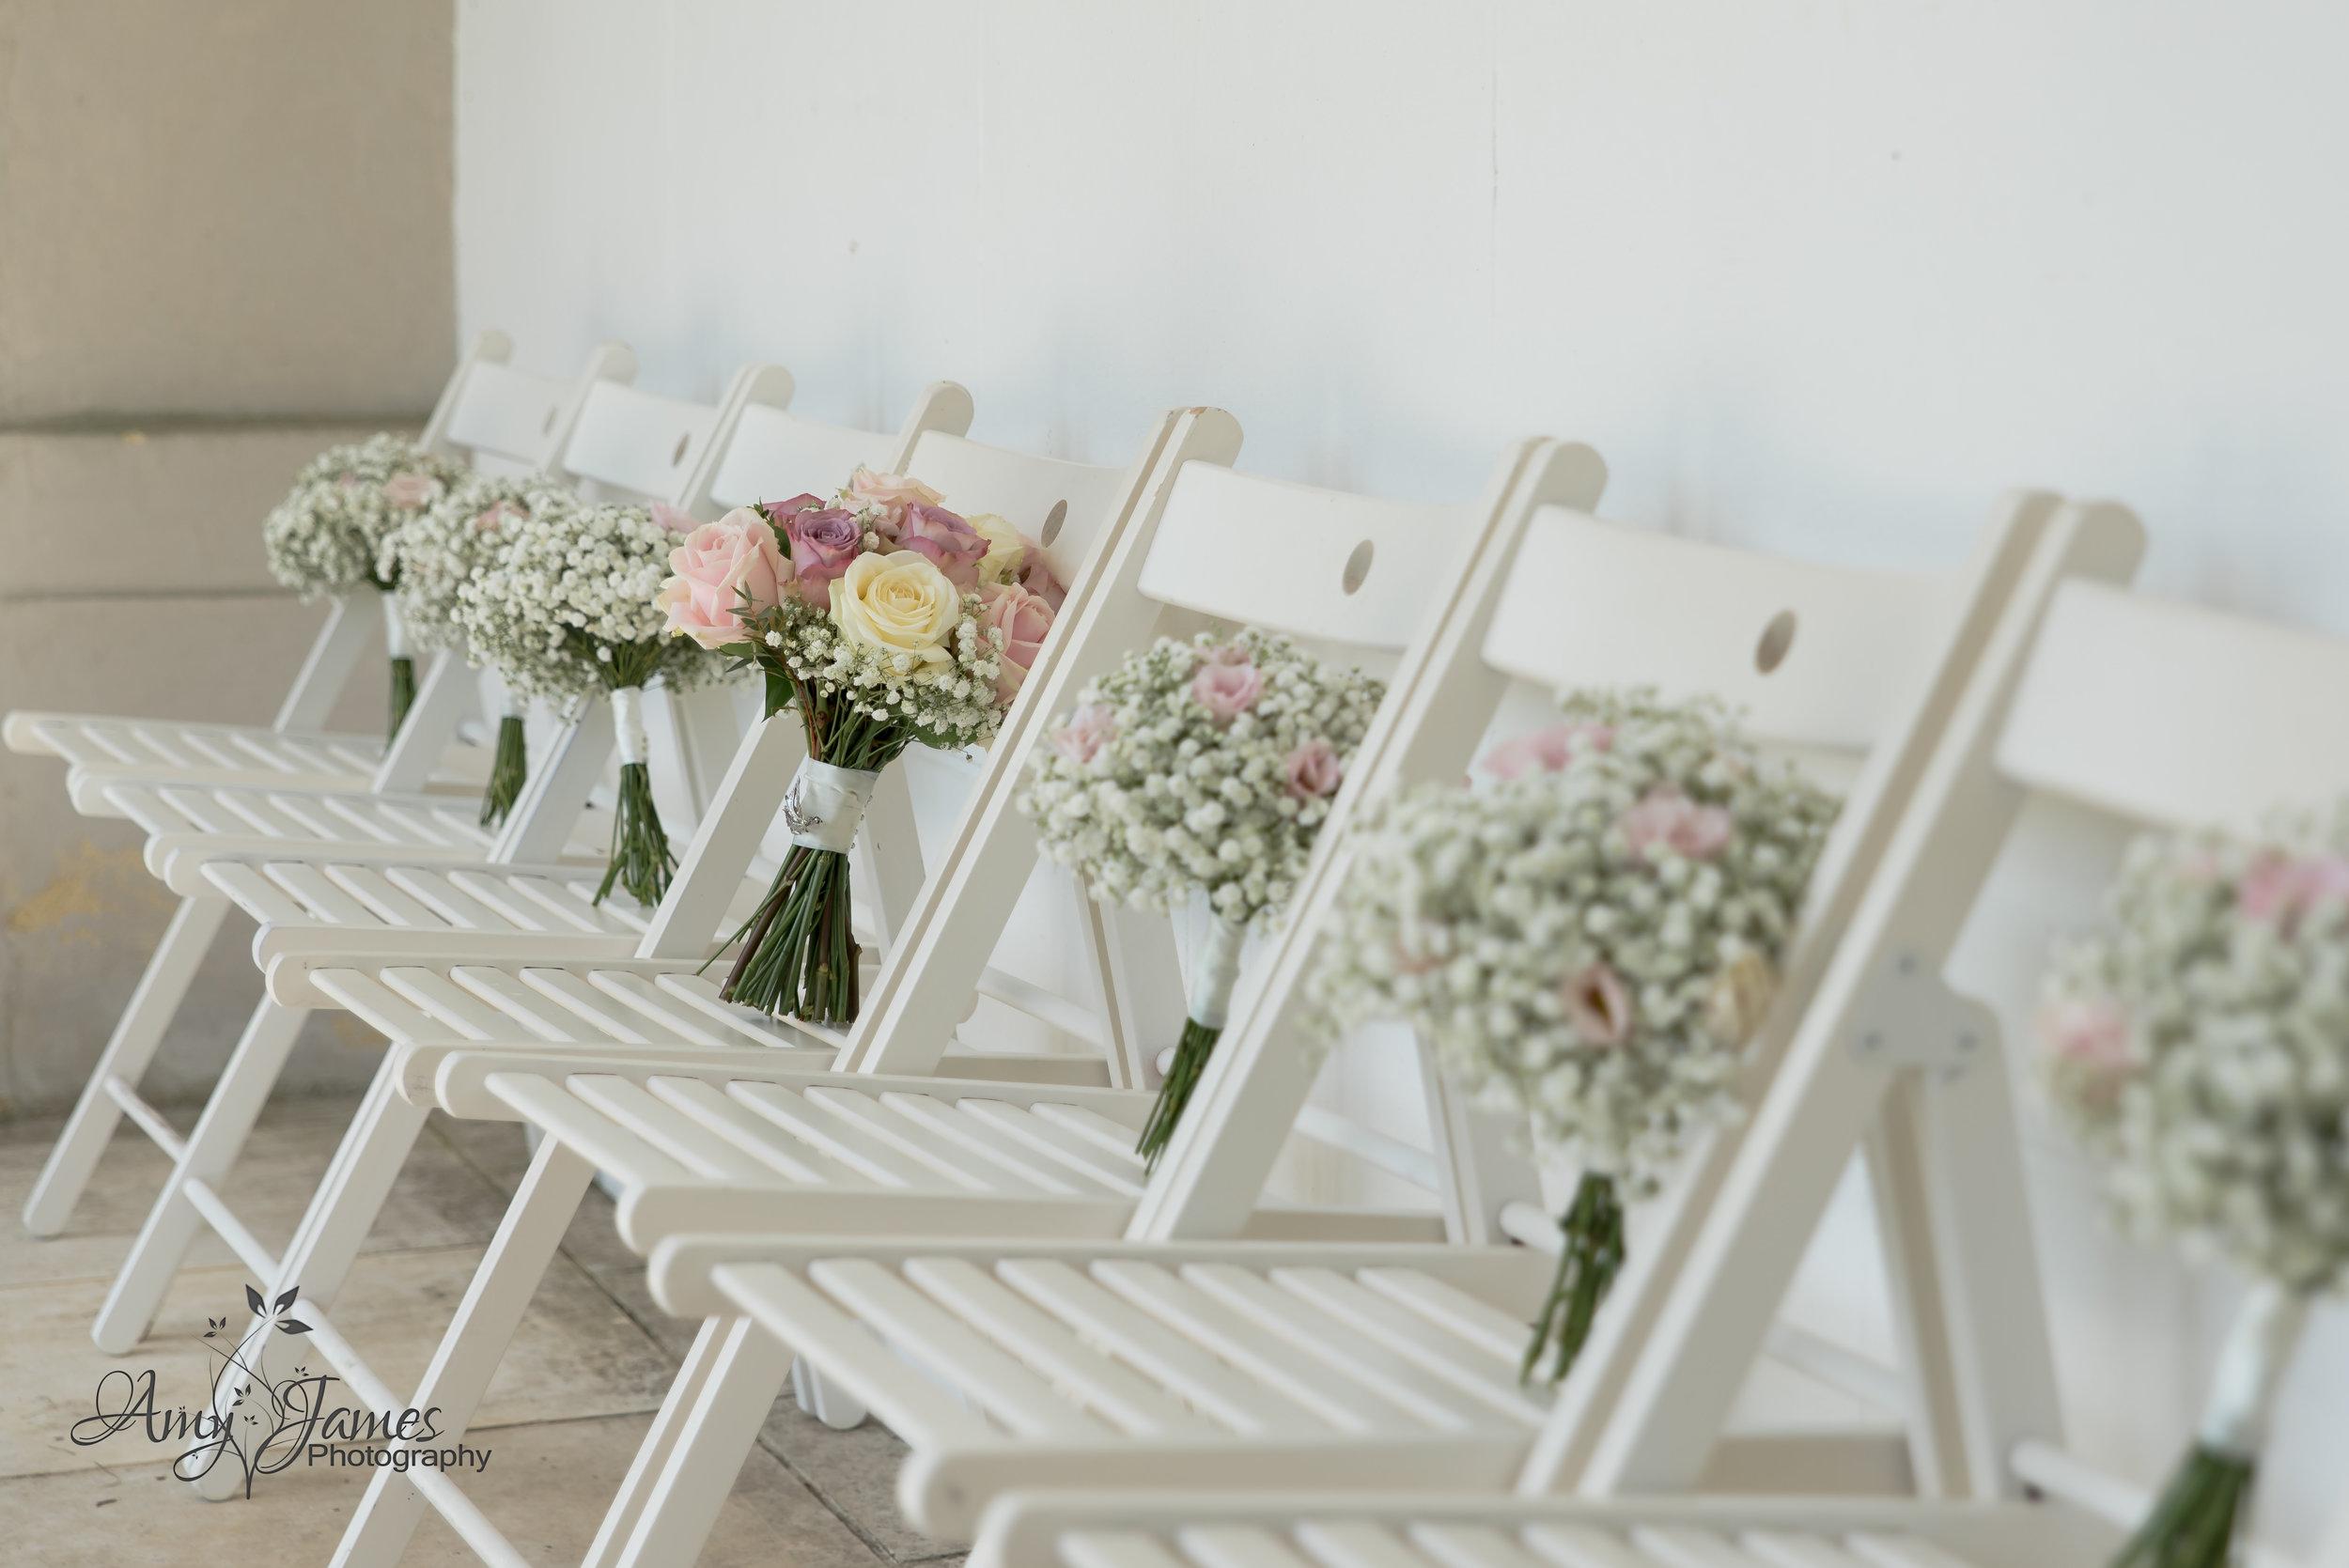 Hampsire Wedding Photographer | FLeet Wedding Photographer | Highfield Park Wedding Venue | Highfield Park wedding Photographer | Amy James Photography | UK outdoor wedding venue